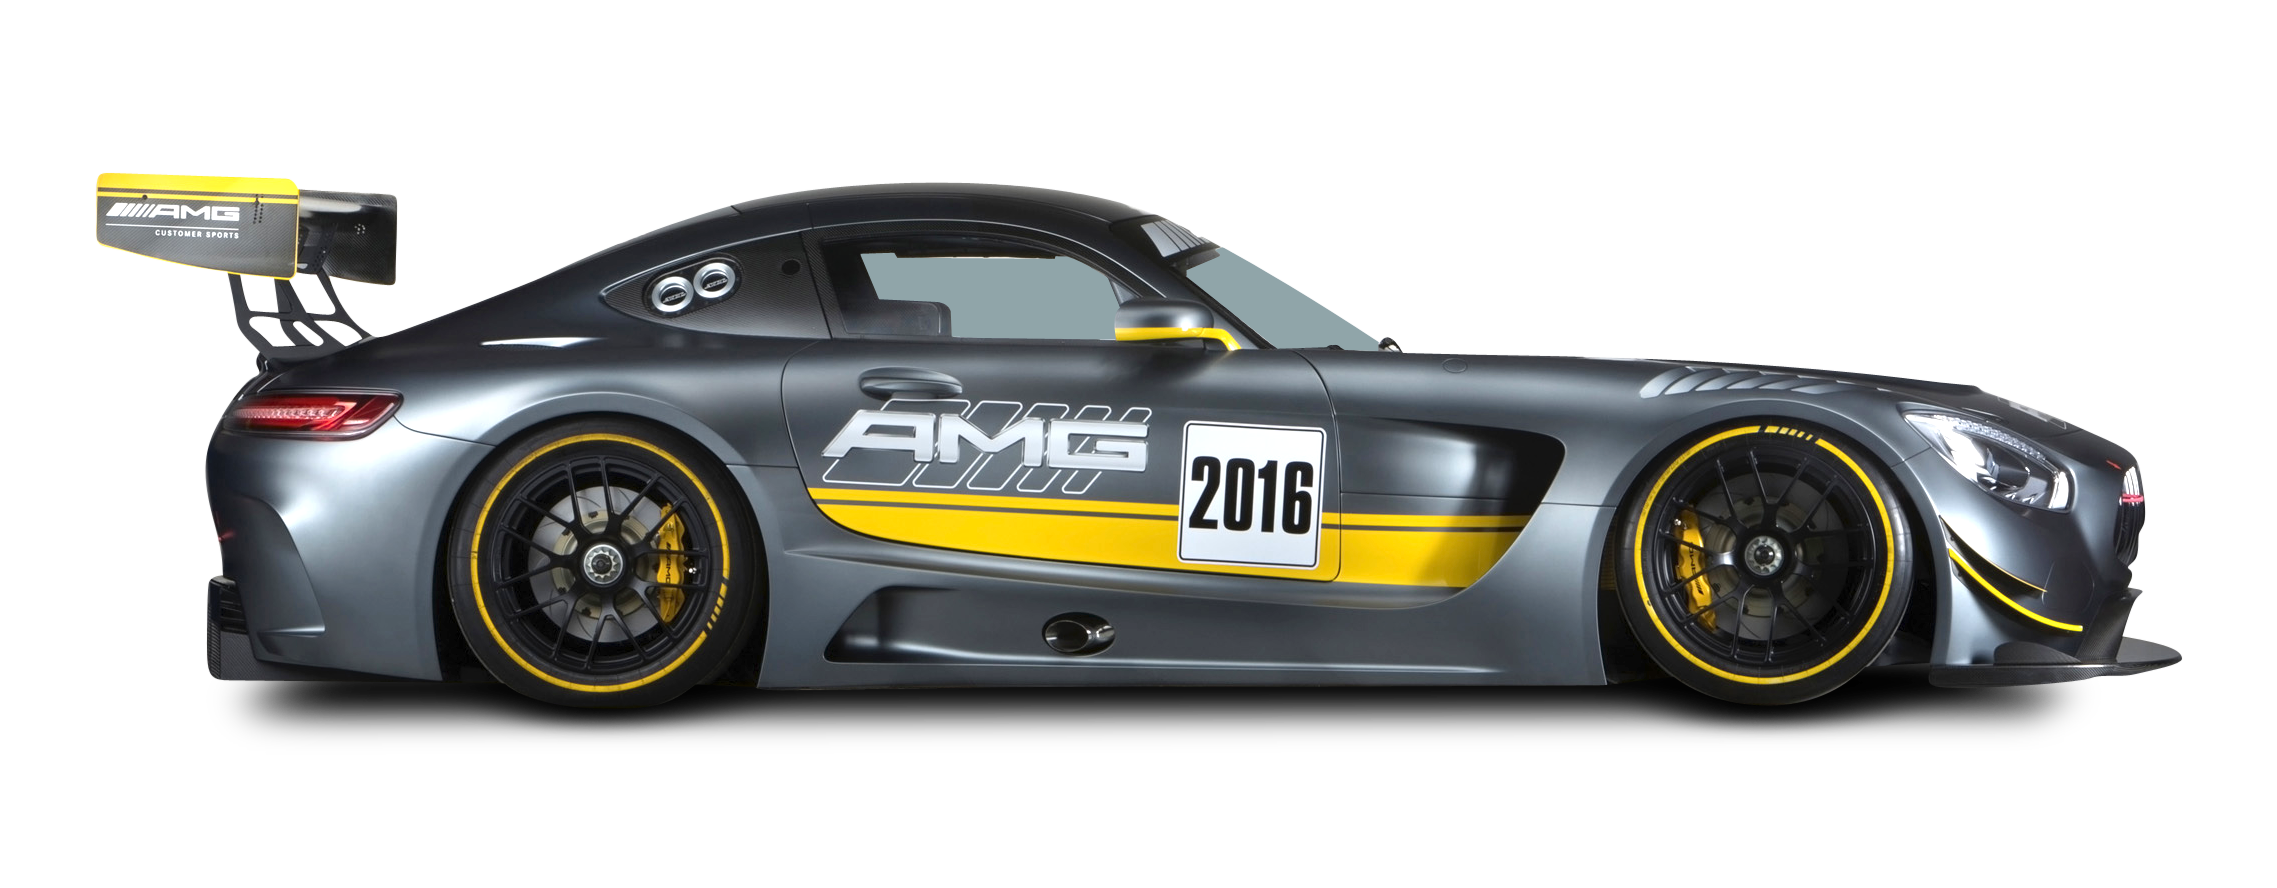 Grey Mercedes AMG GT3 Racing Car